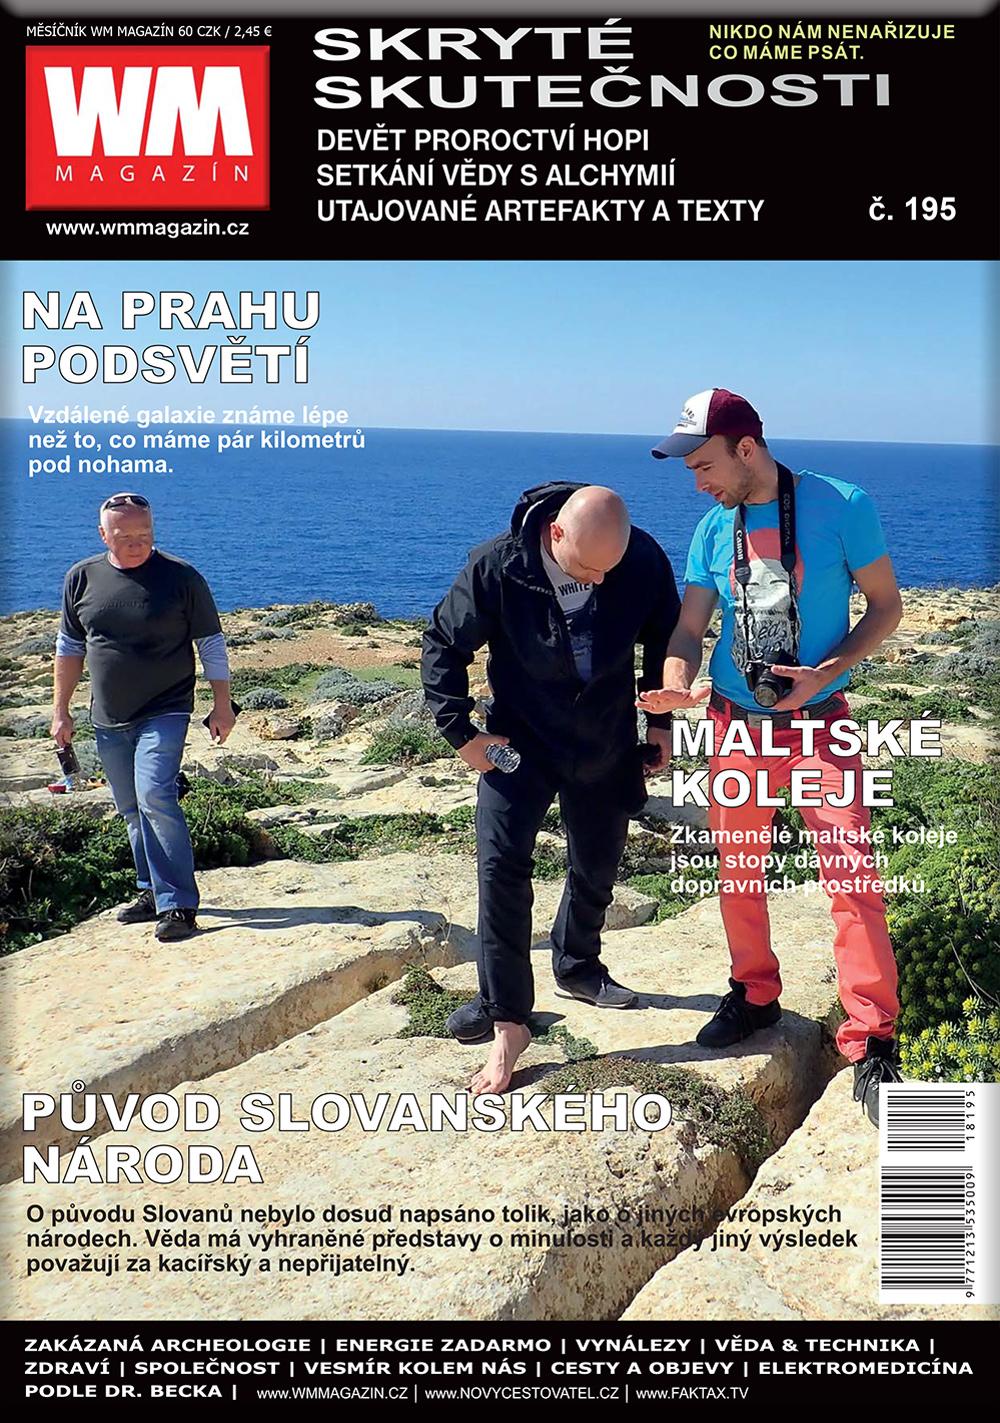 wm-195-casopis-wm-magazin-skryte-skutecn